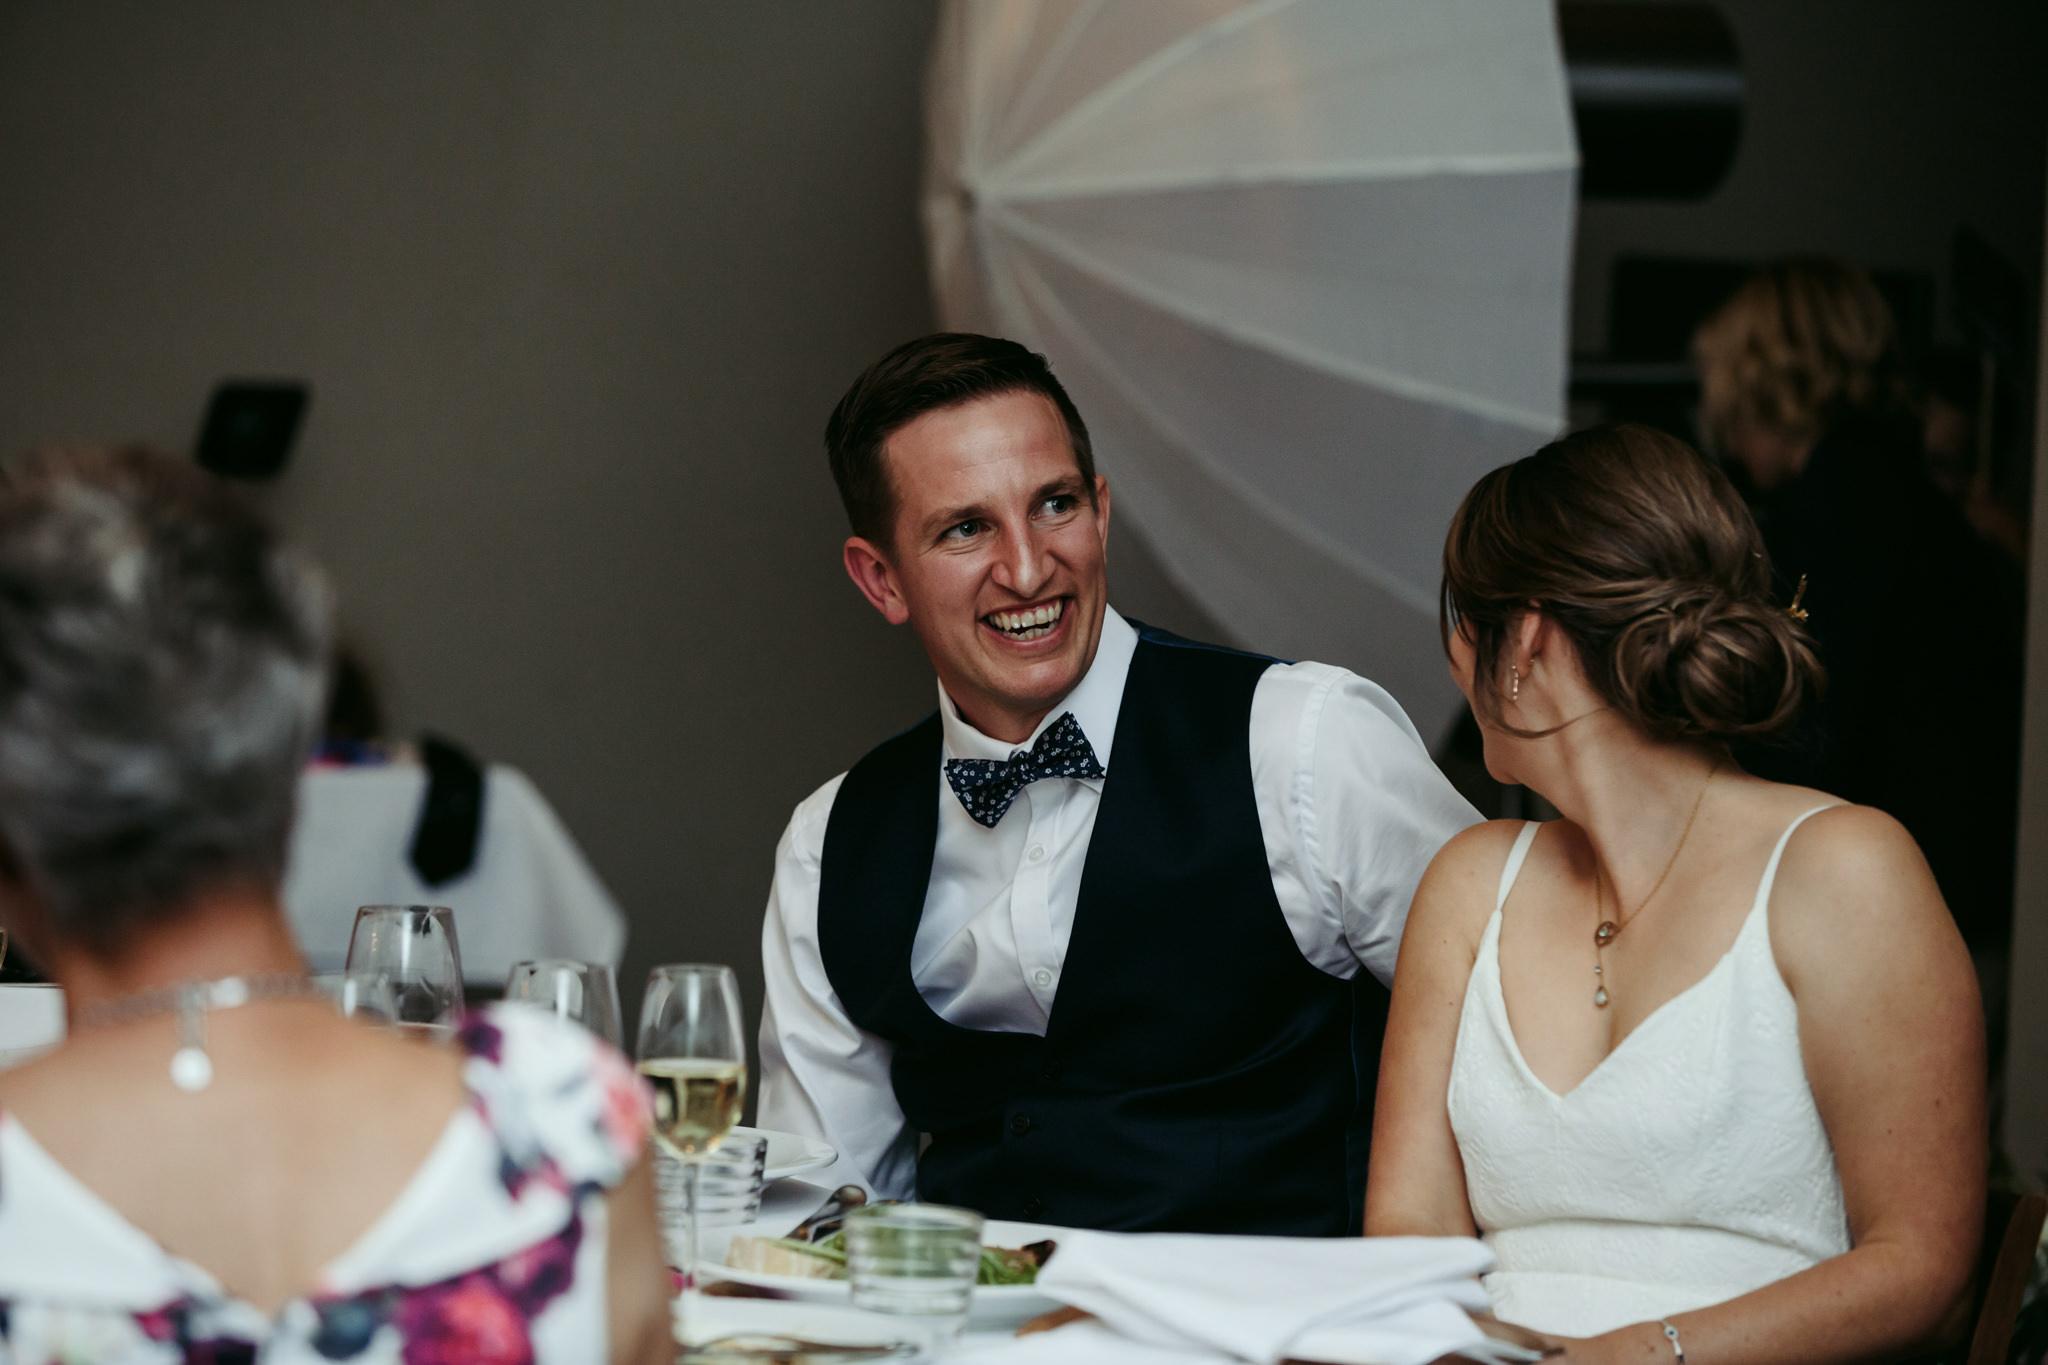 Erin Latimore Mudgee Canberra Wedding Photographer ROSEBANK GUESTHOUSE OLD THEATRE TONIC MILLTHORPE_746.JPG